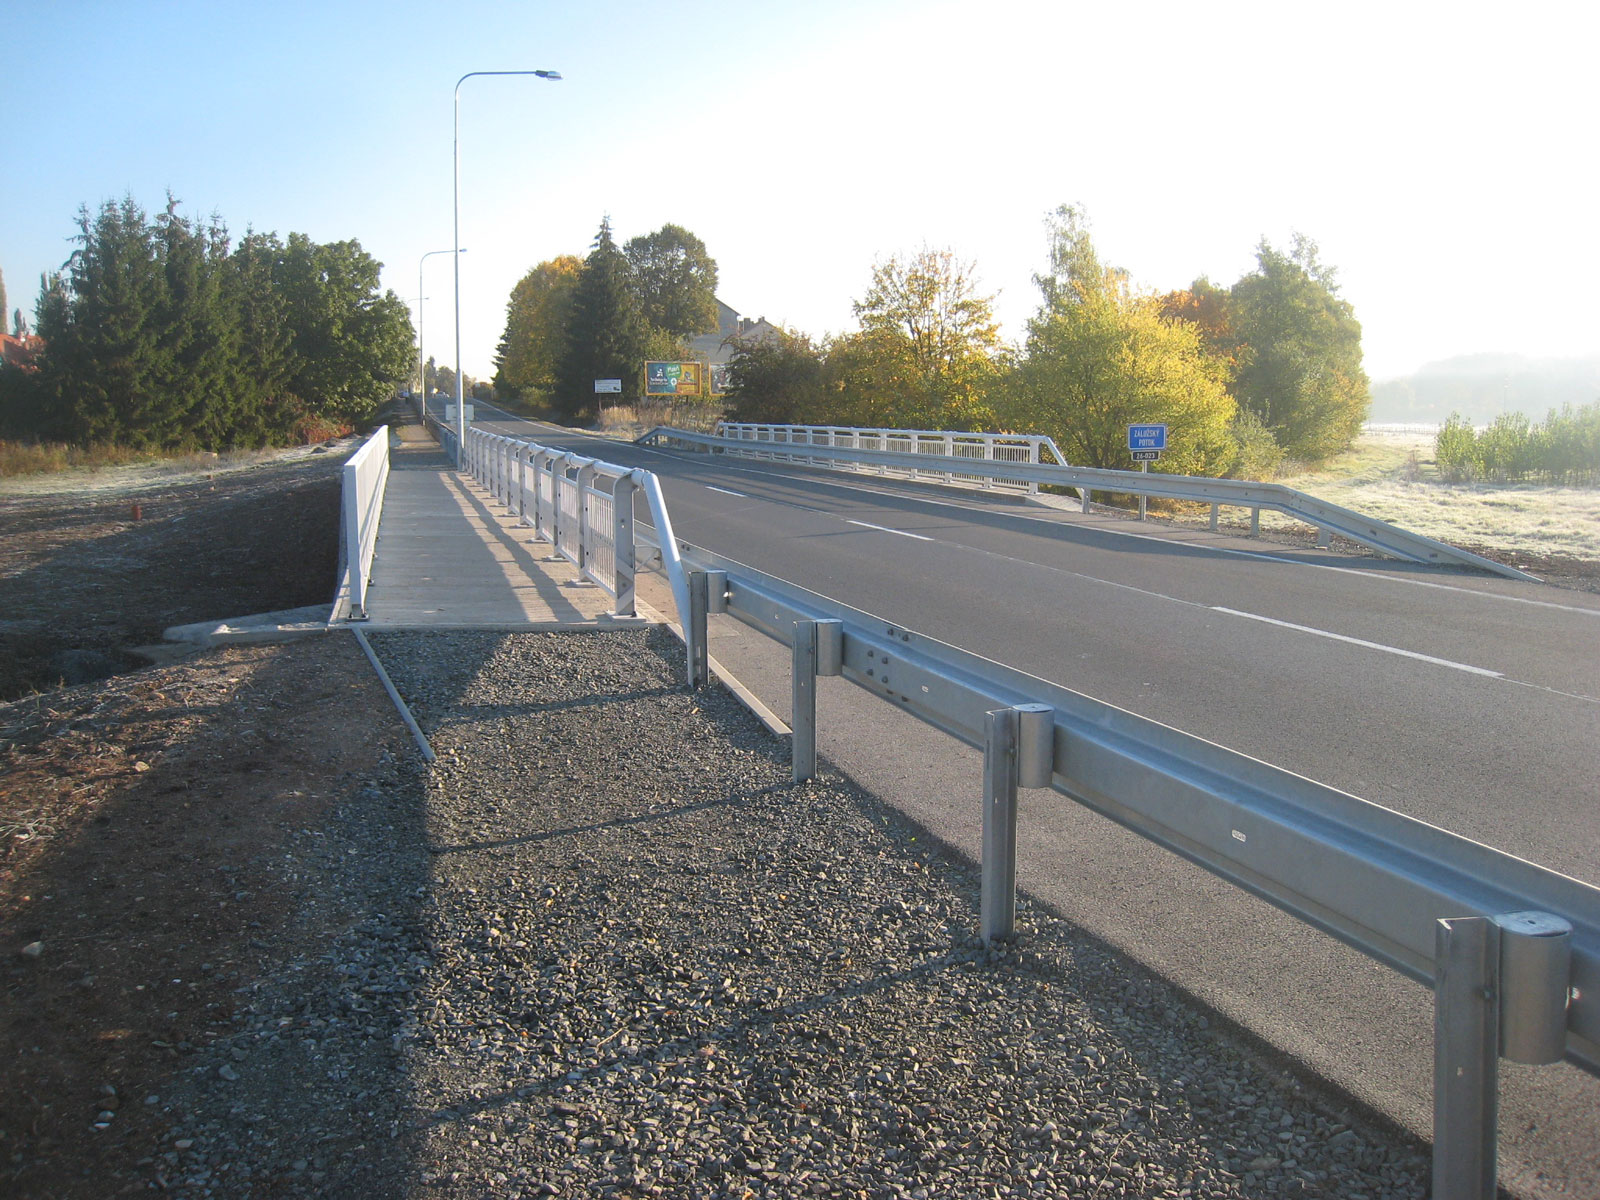 Zbůch Bridge, Czech Republic